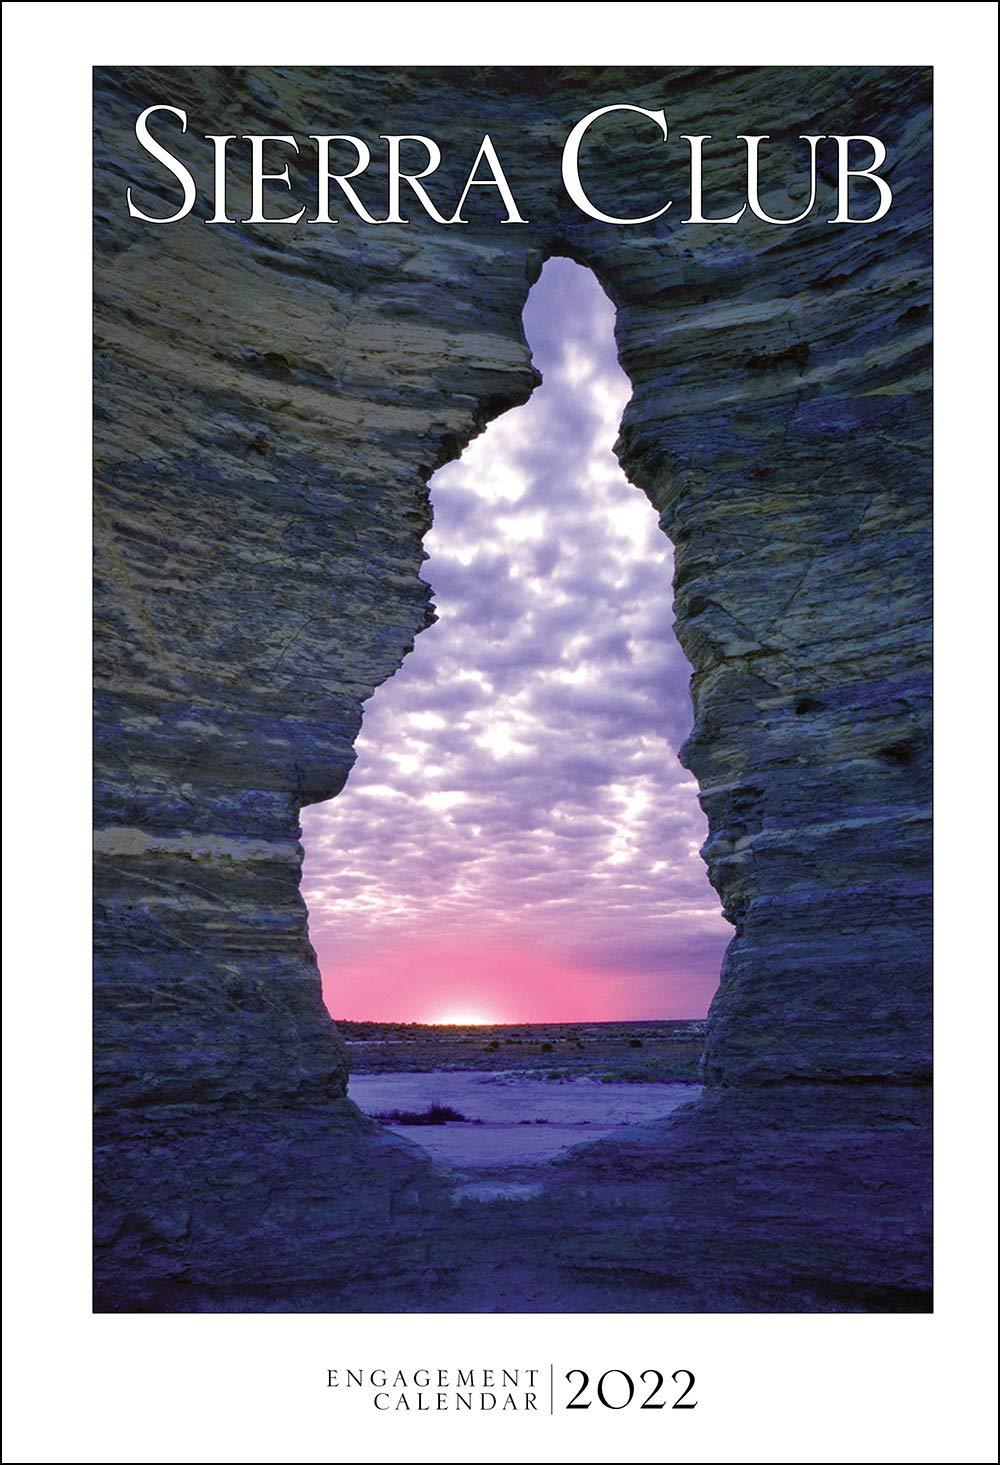 Sierra College Calendar 2022.Sierra Club Engagement Calendar 2022 Sierra Club 9781578052325 Amazon Com Books